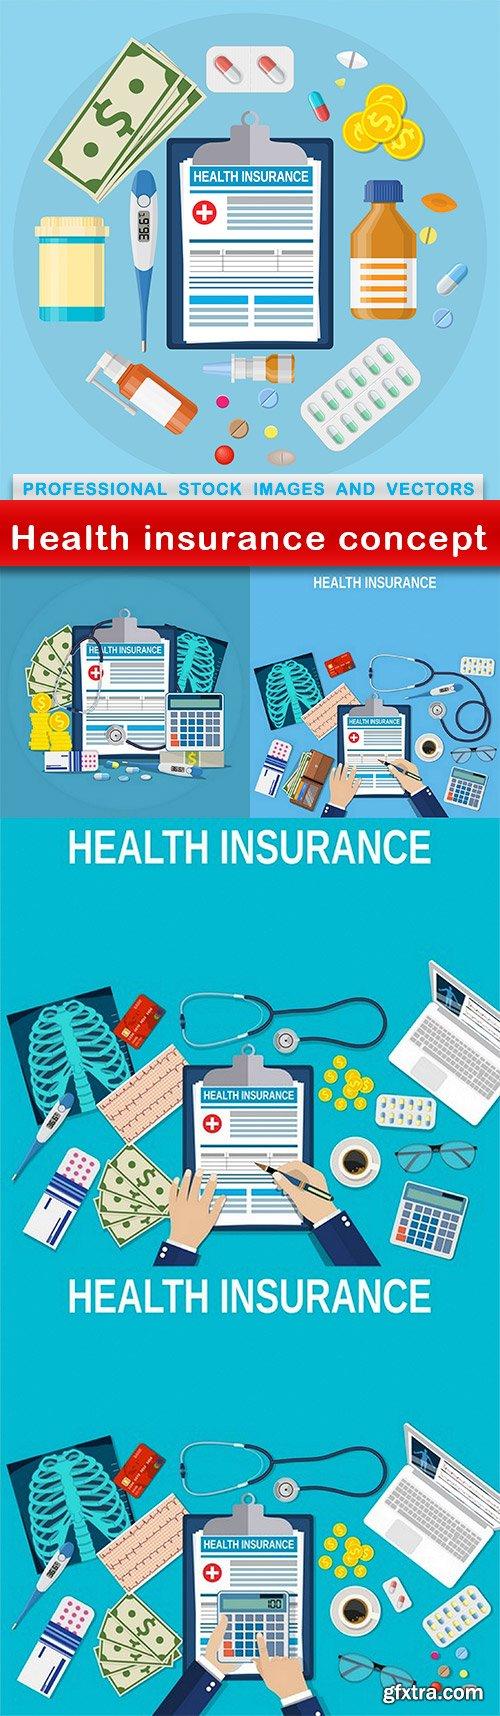 Health insurance concept - 5 EPS